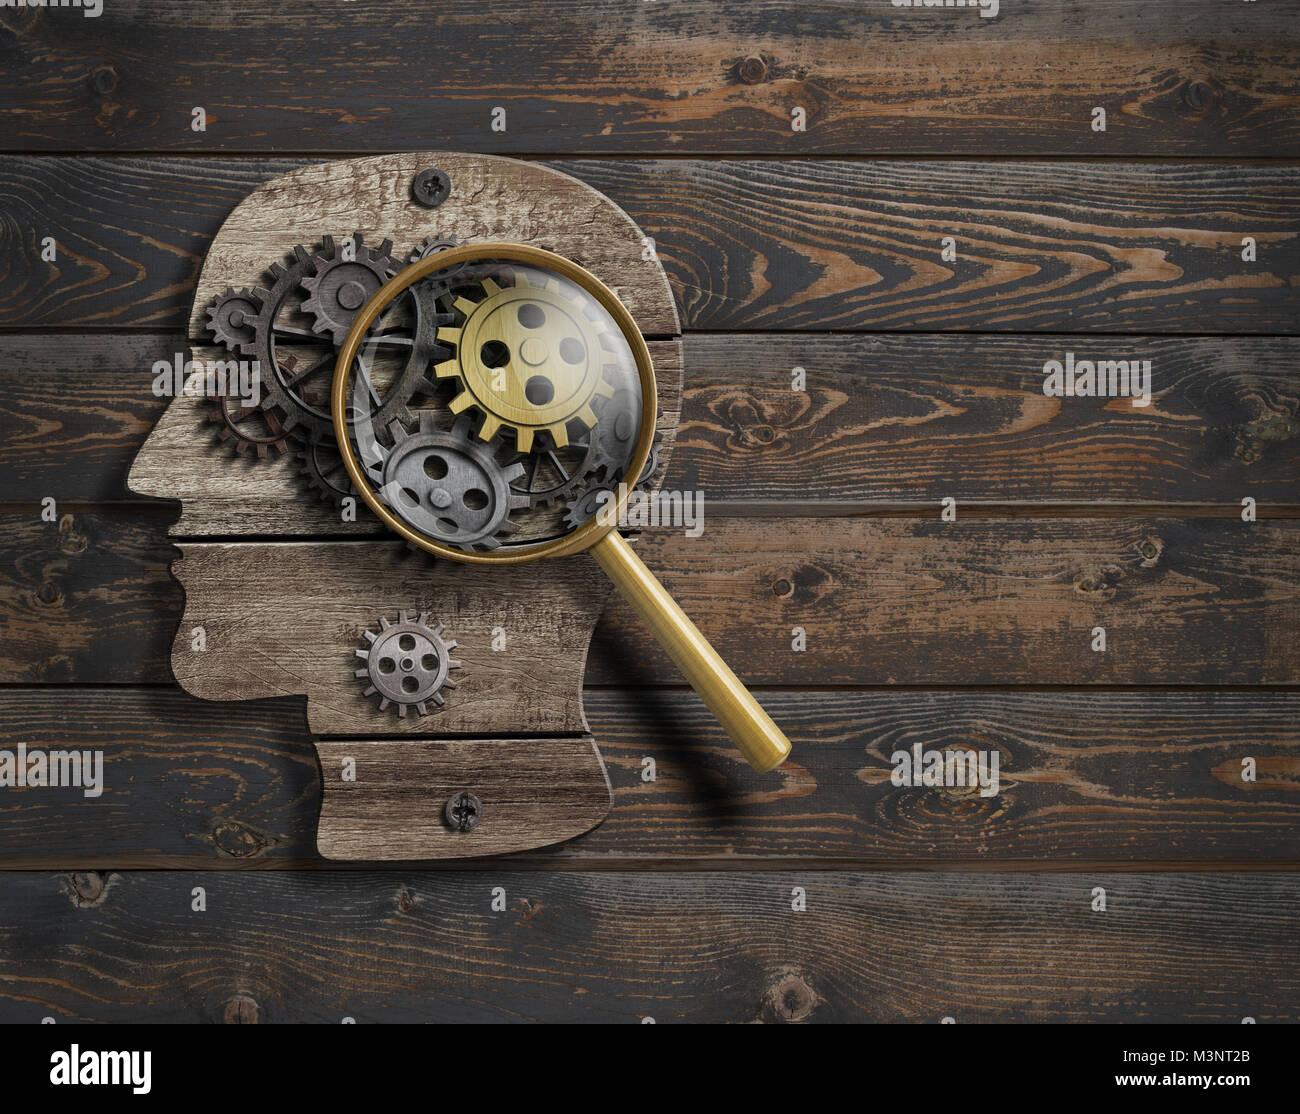 Psychology or invent conception. Brain function model 3d illustration. - Stock Image